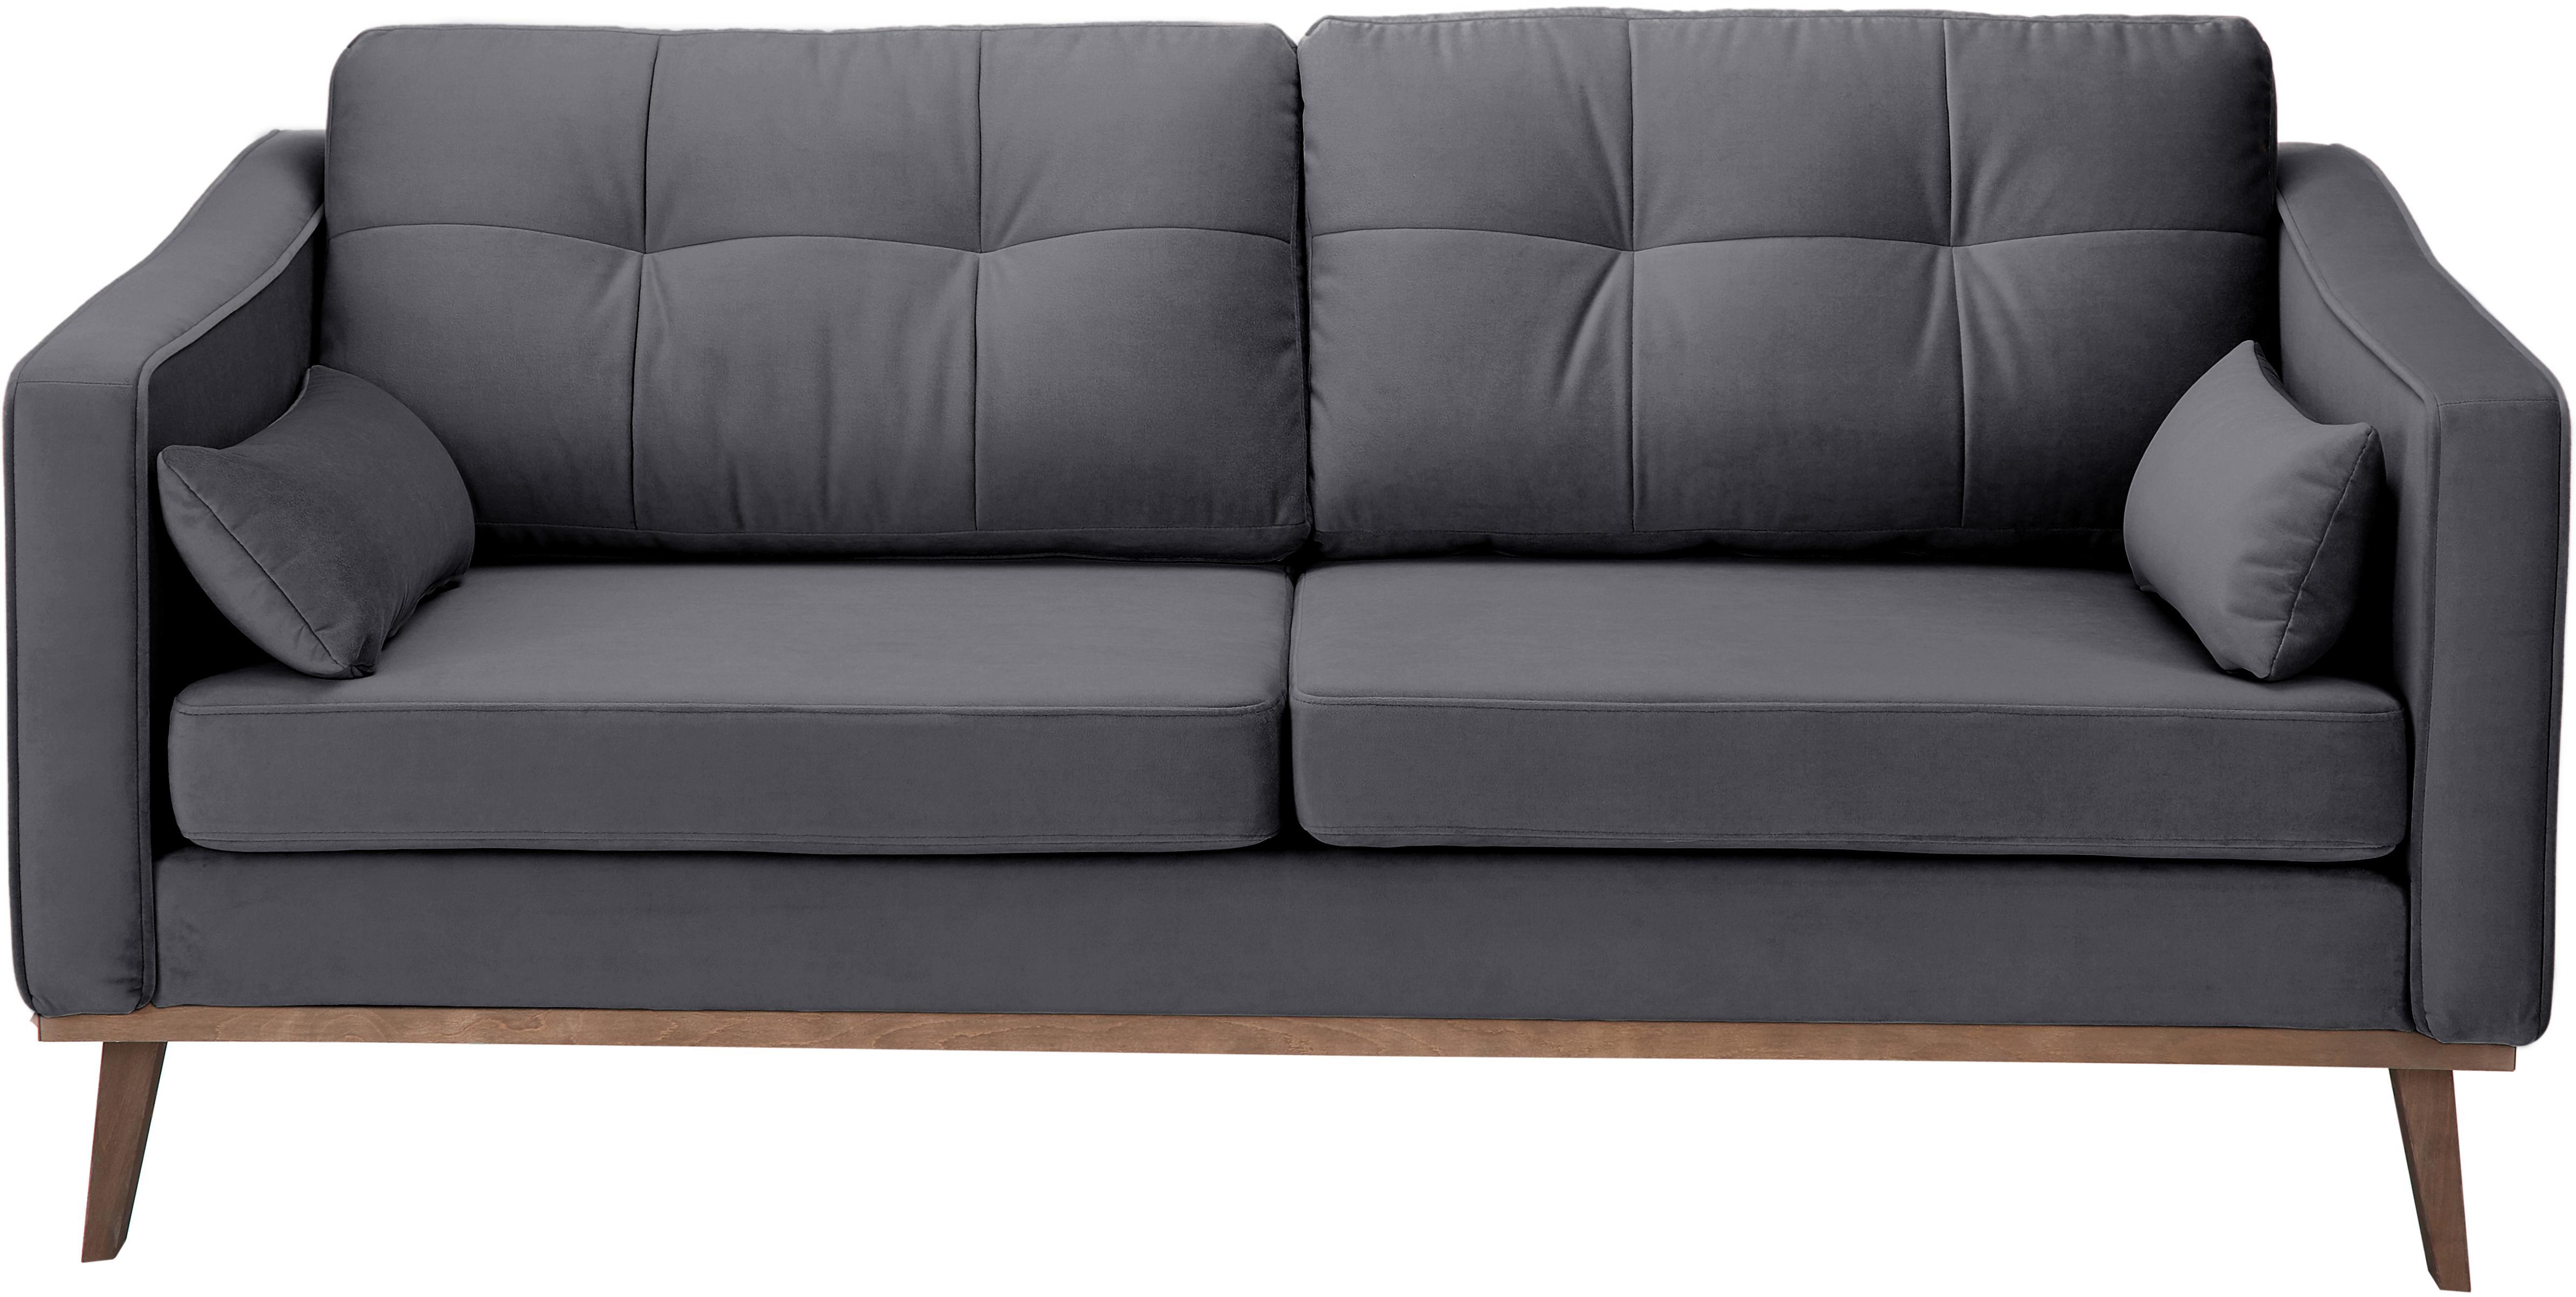 Samt-Sofa Alva (2-Sitzer), Bezug: Samt (Hochwertiger Polyes, Gestell: Massives Kiefernholz, Füße: Massives Buchenholz, gebe, Dunkelgrau, B 184x T 94 cm